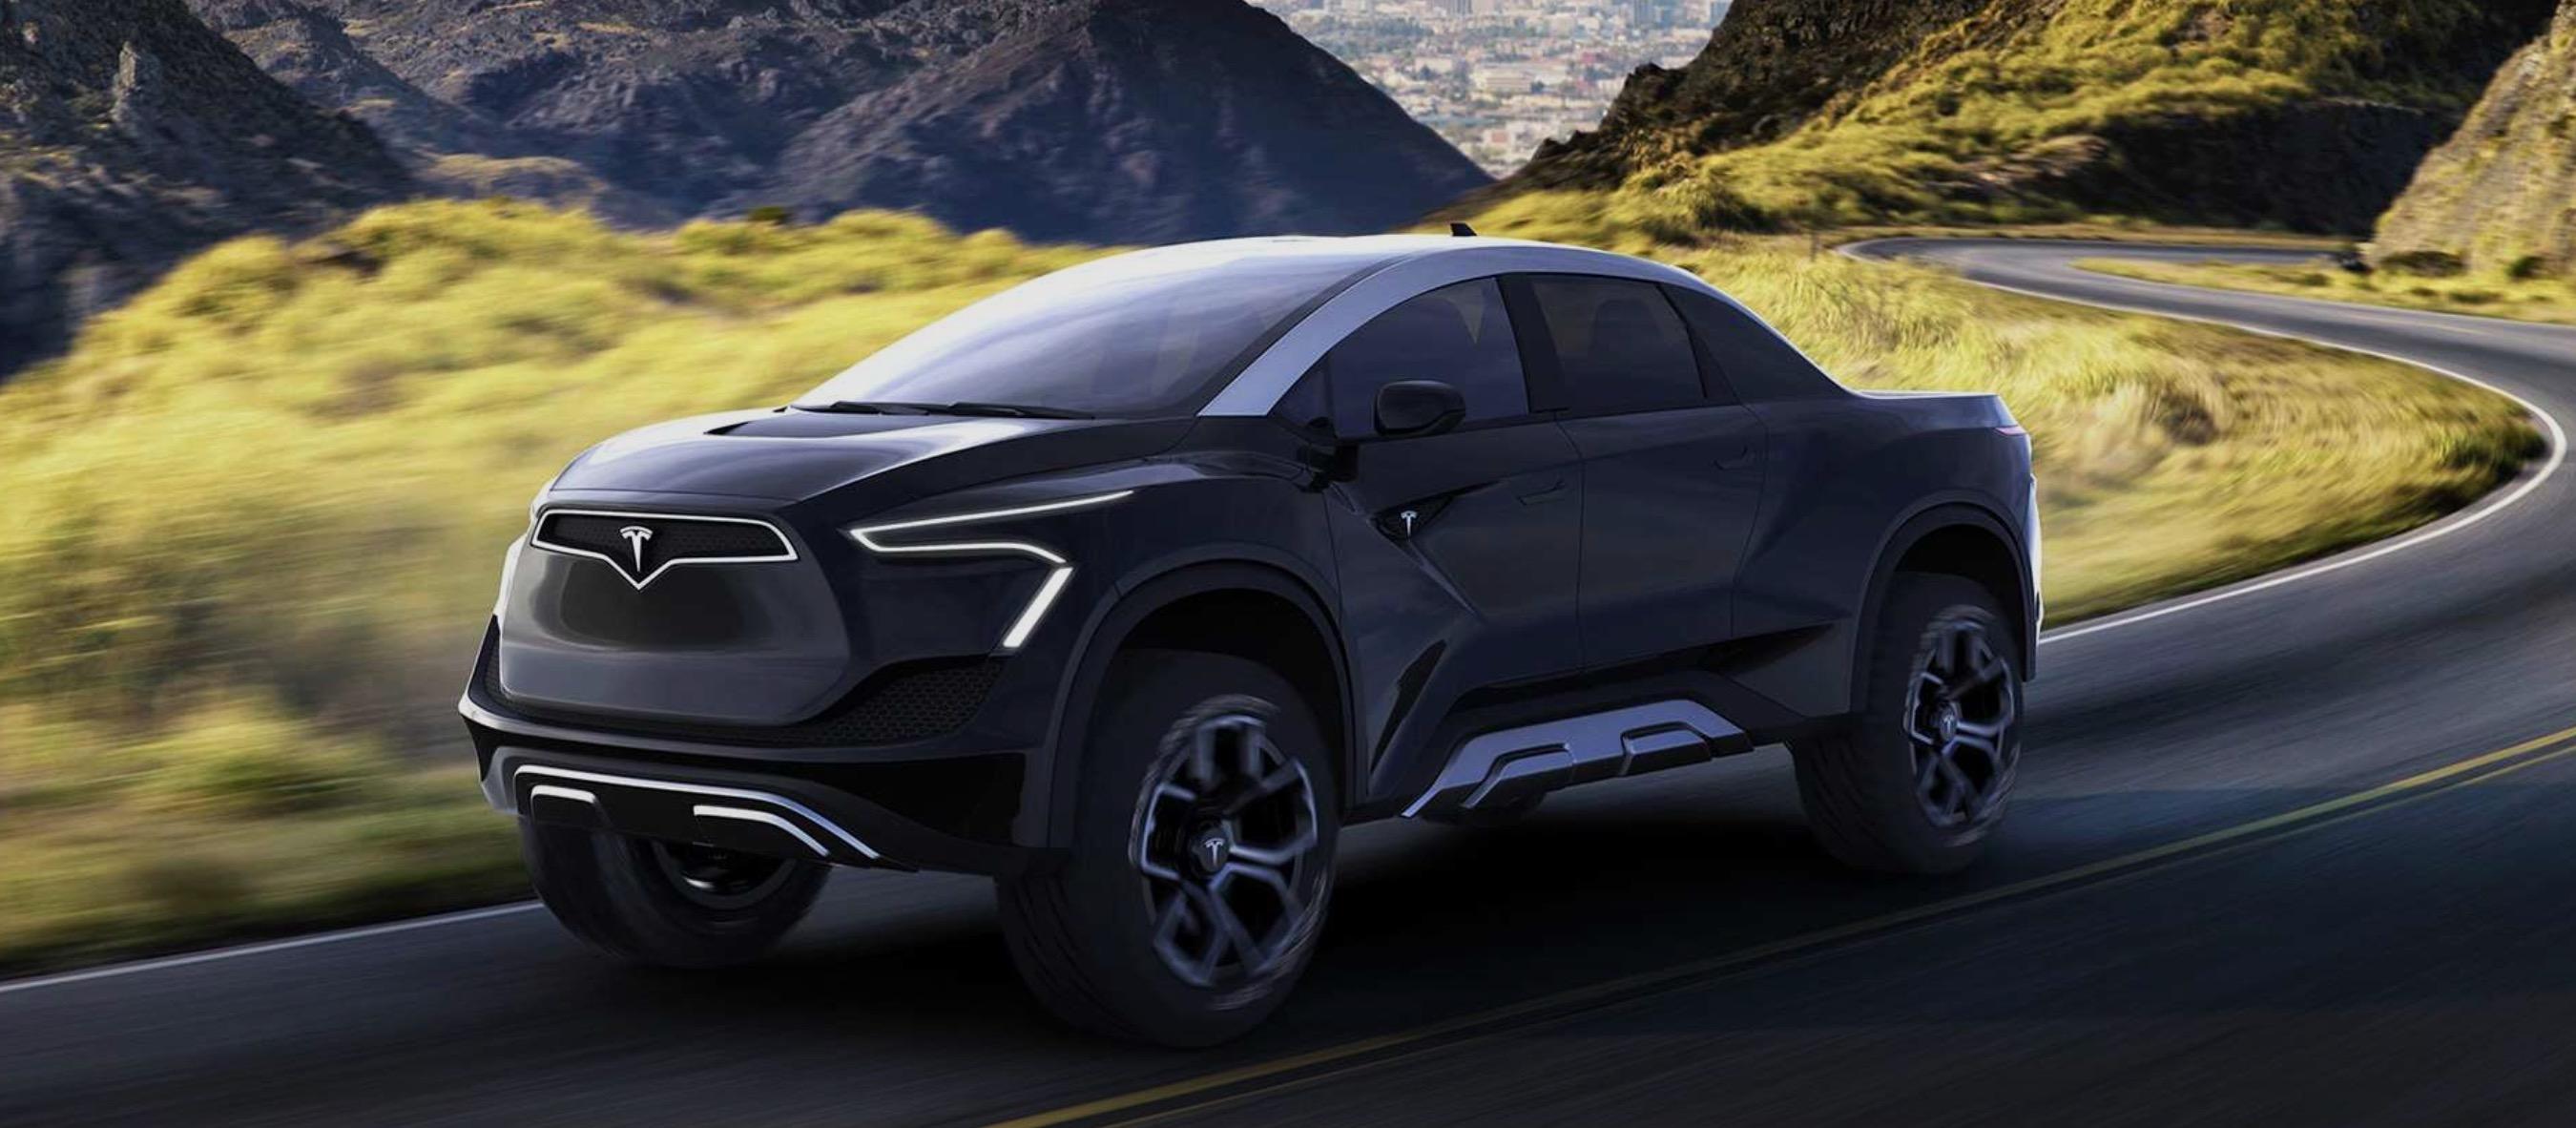 Elon Musk says Tesla Pickup truck looks even more 'Blade Runner-esque' than this - Electrek